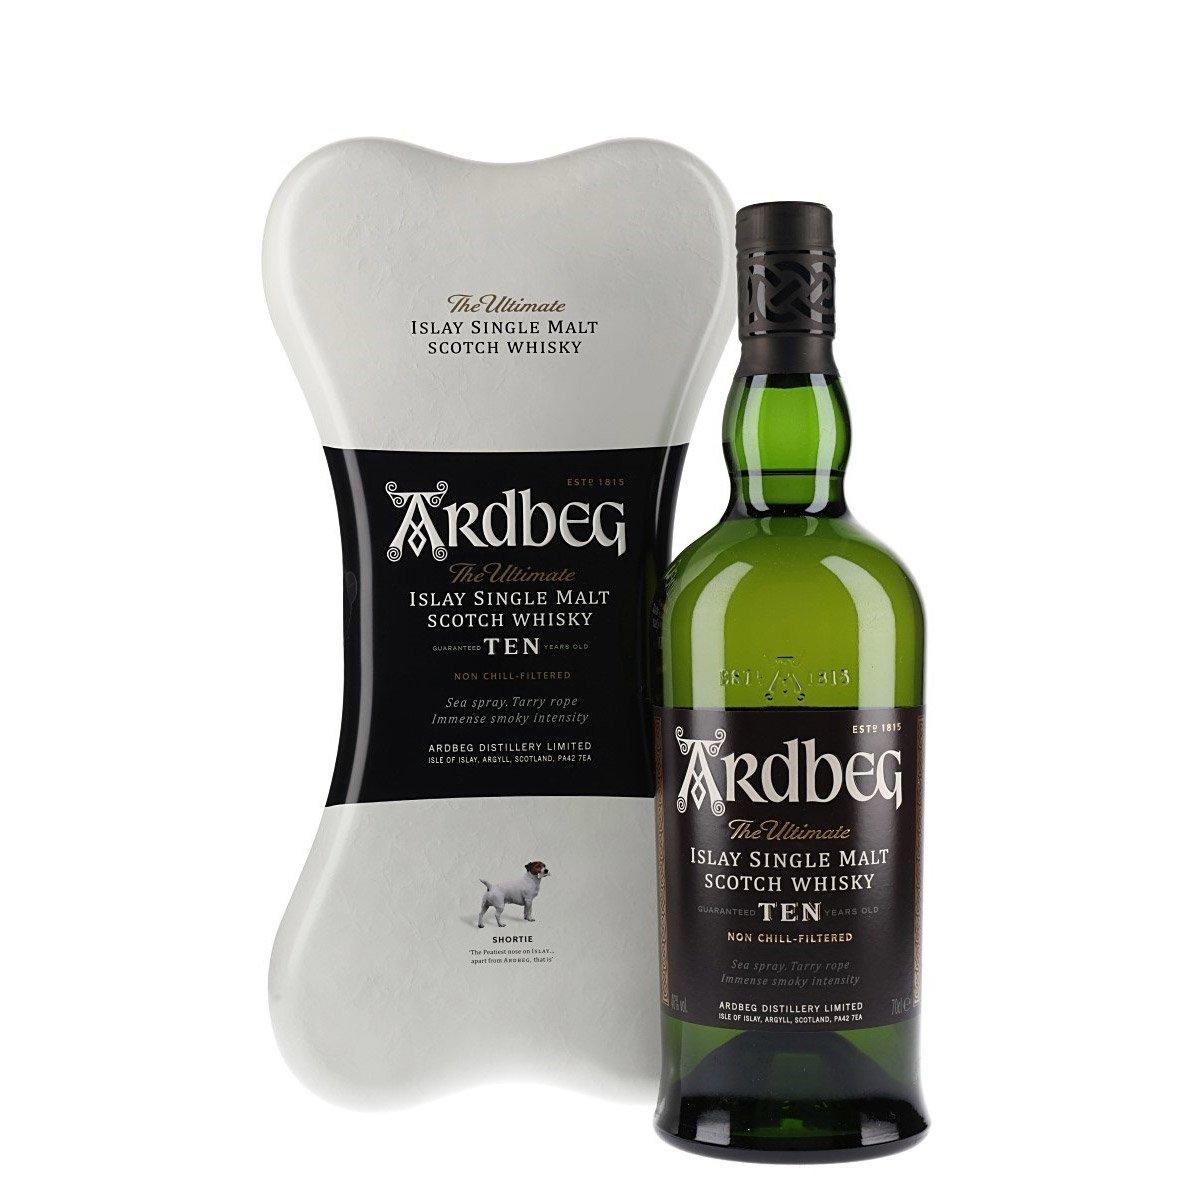 Ardbeg Ten Years Old Whisky